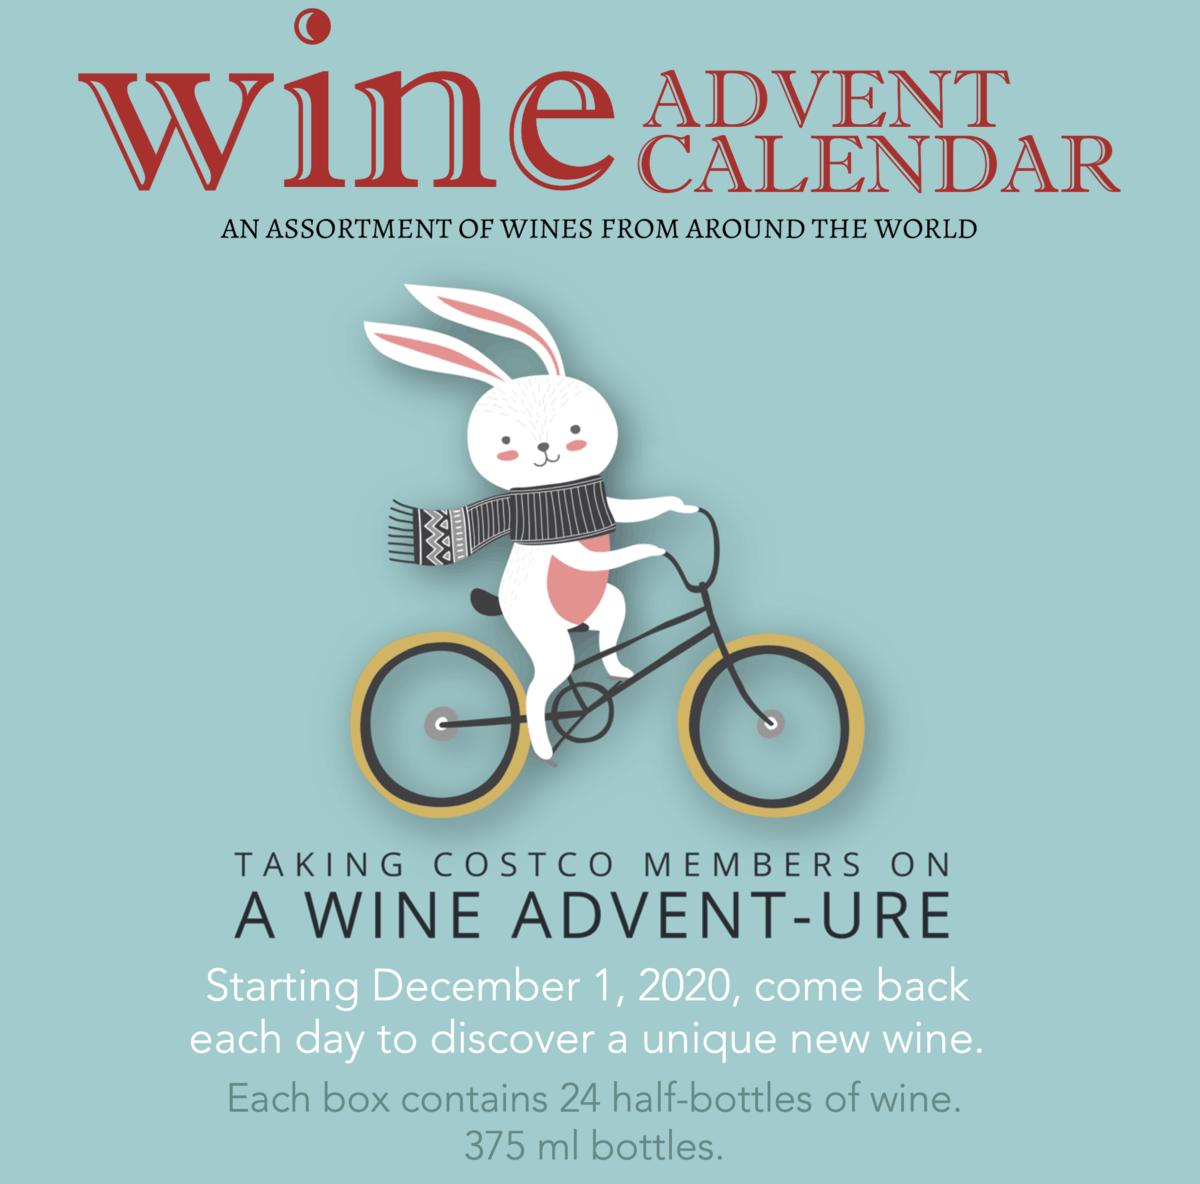 Costco 2020 Wine Advent Calendar – On Sale Now!